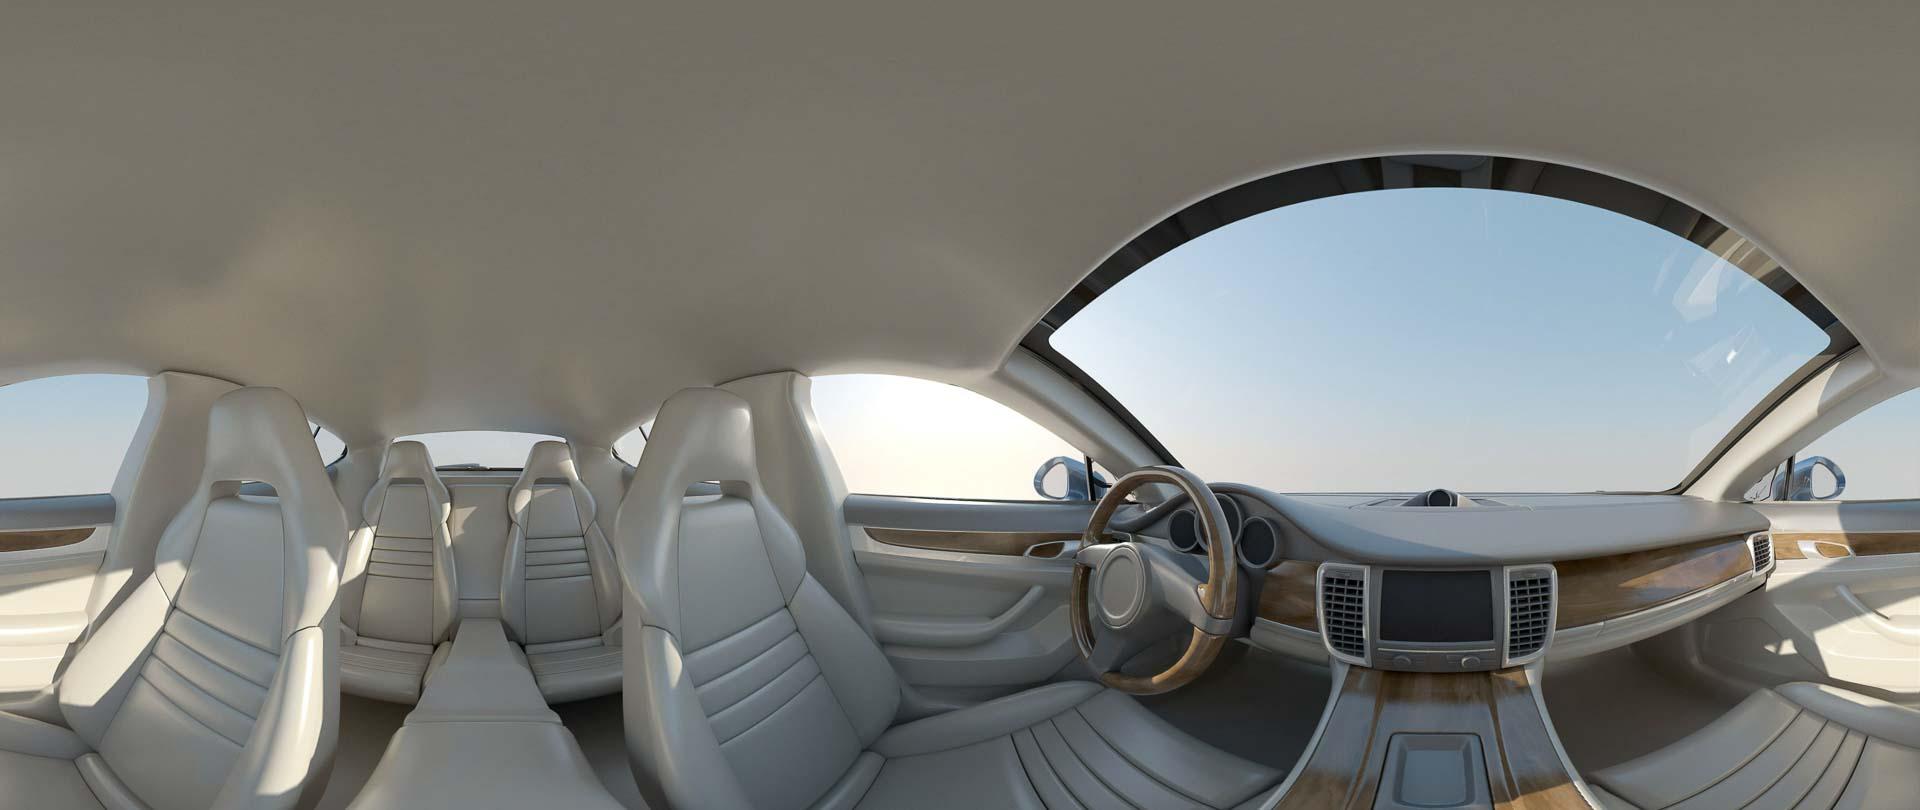 virtual tour 360 Veicoli e imbarcazioni